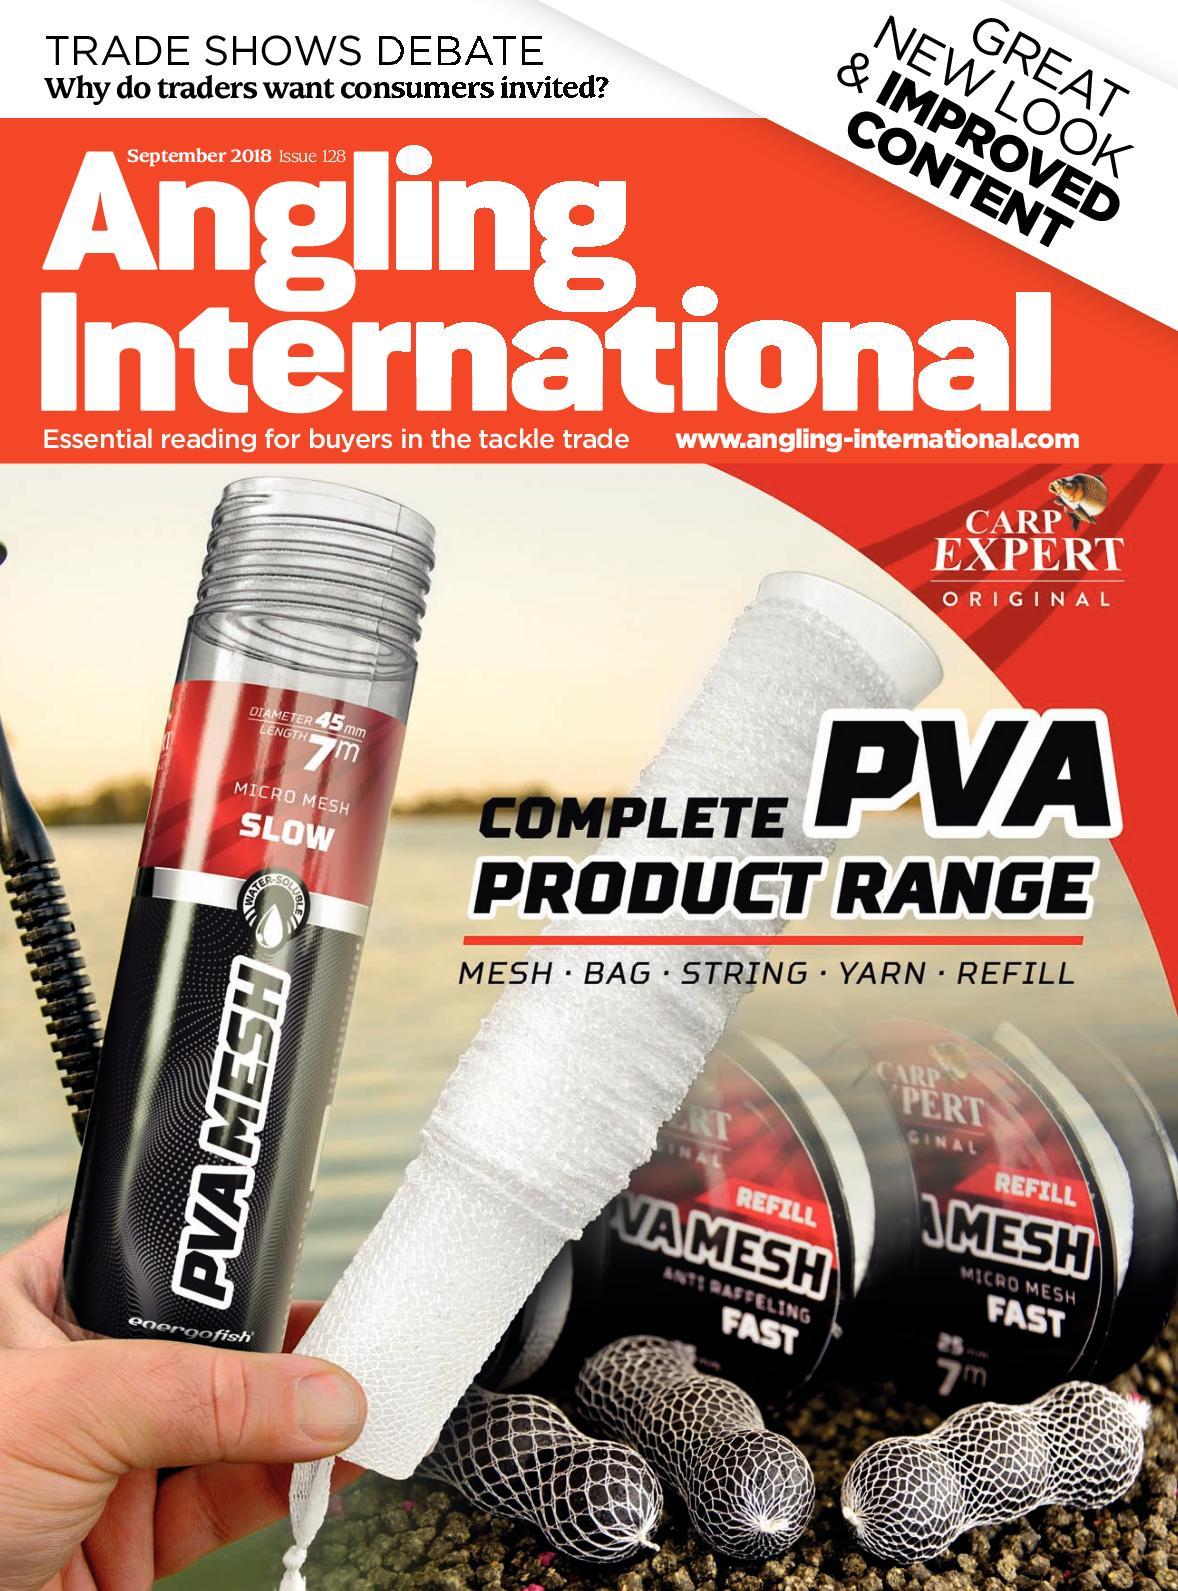 b59007ec2dc Calaméo - Angling International - September 2018 - issue 128